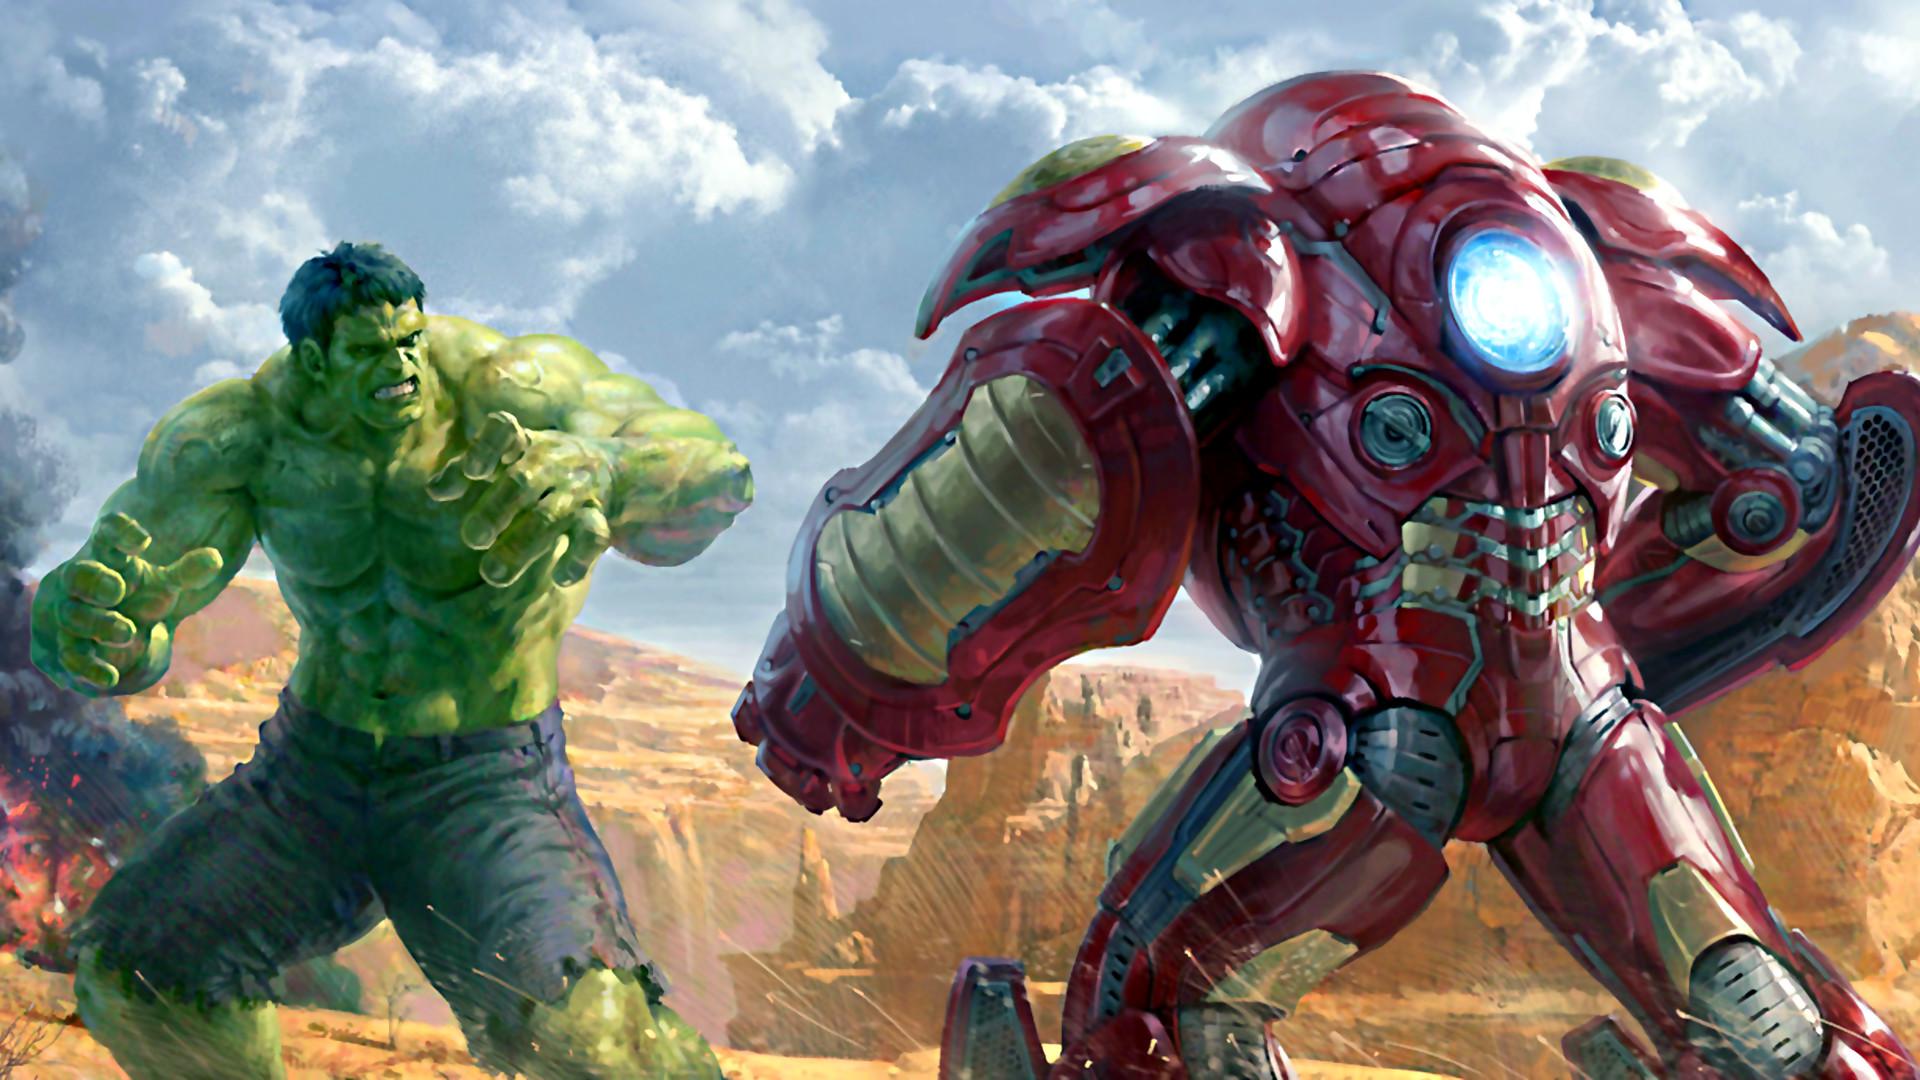 Comics – Iron Man Wallpaper